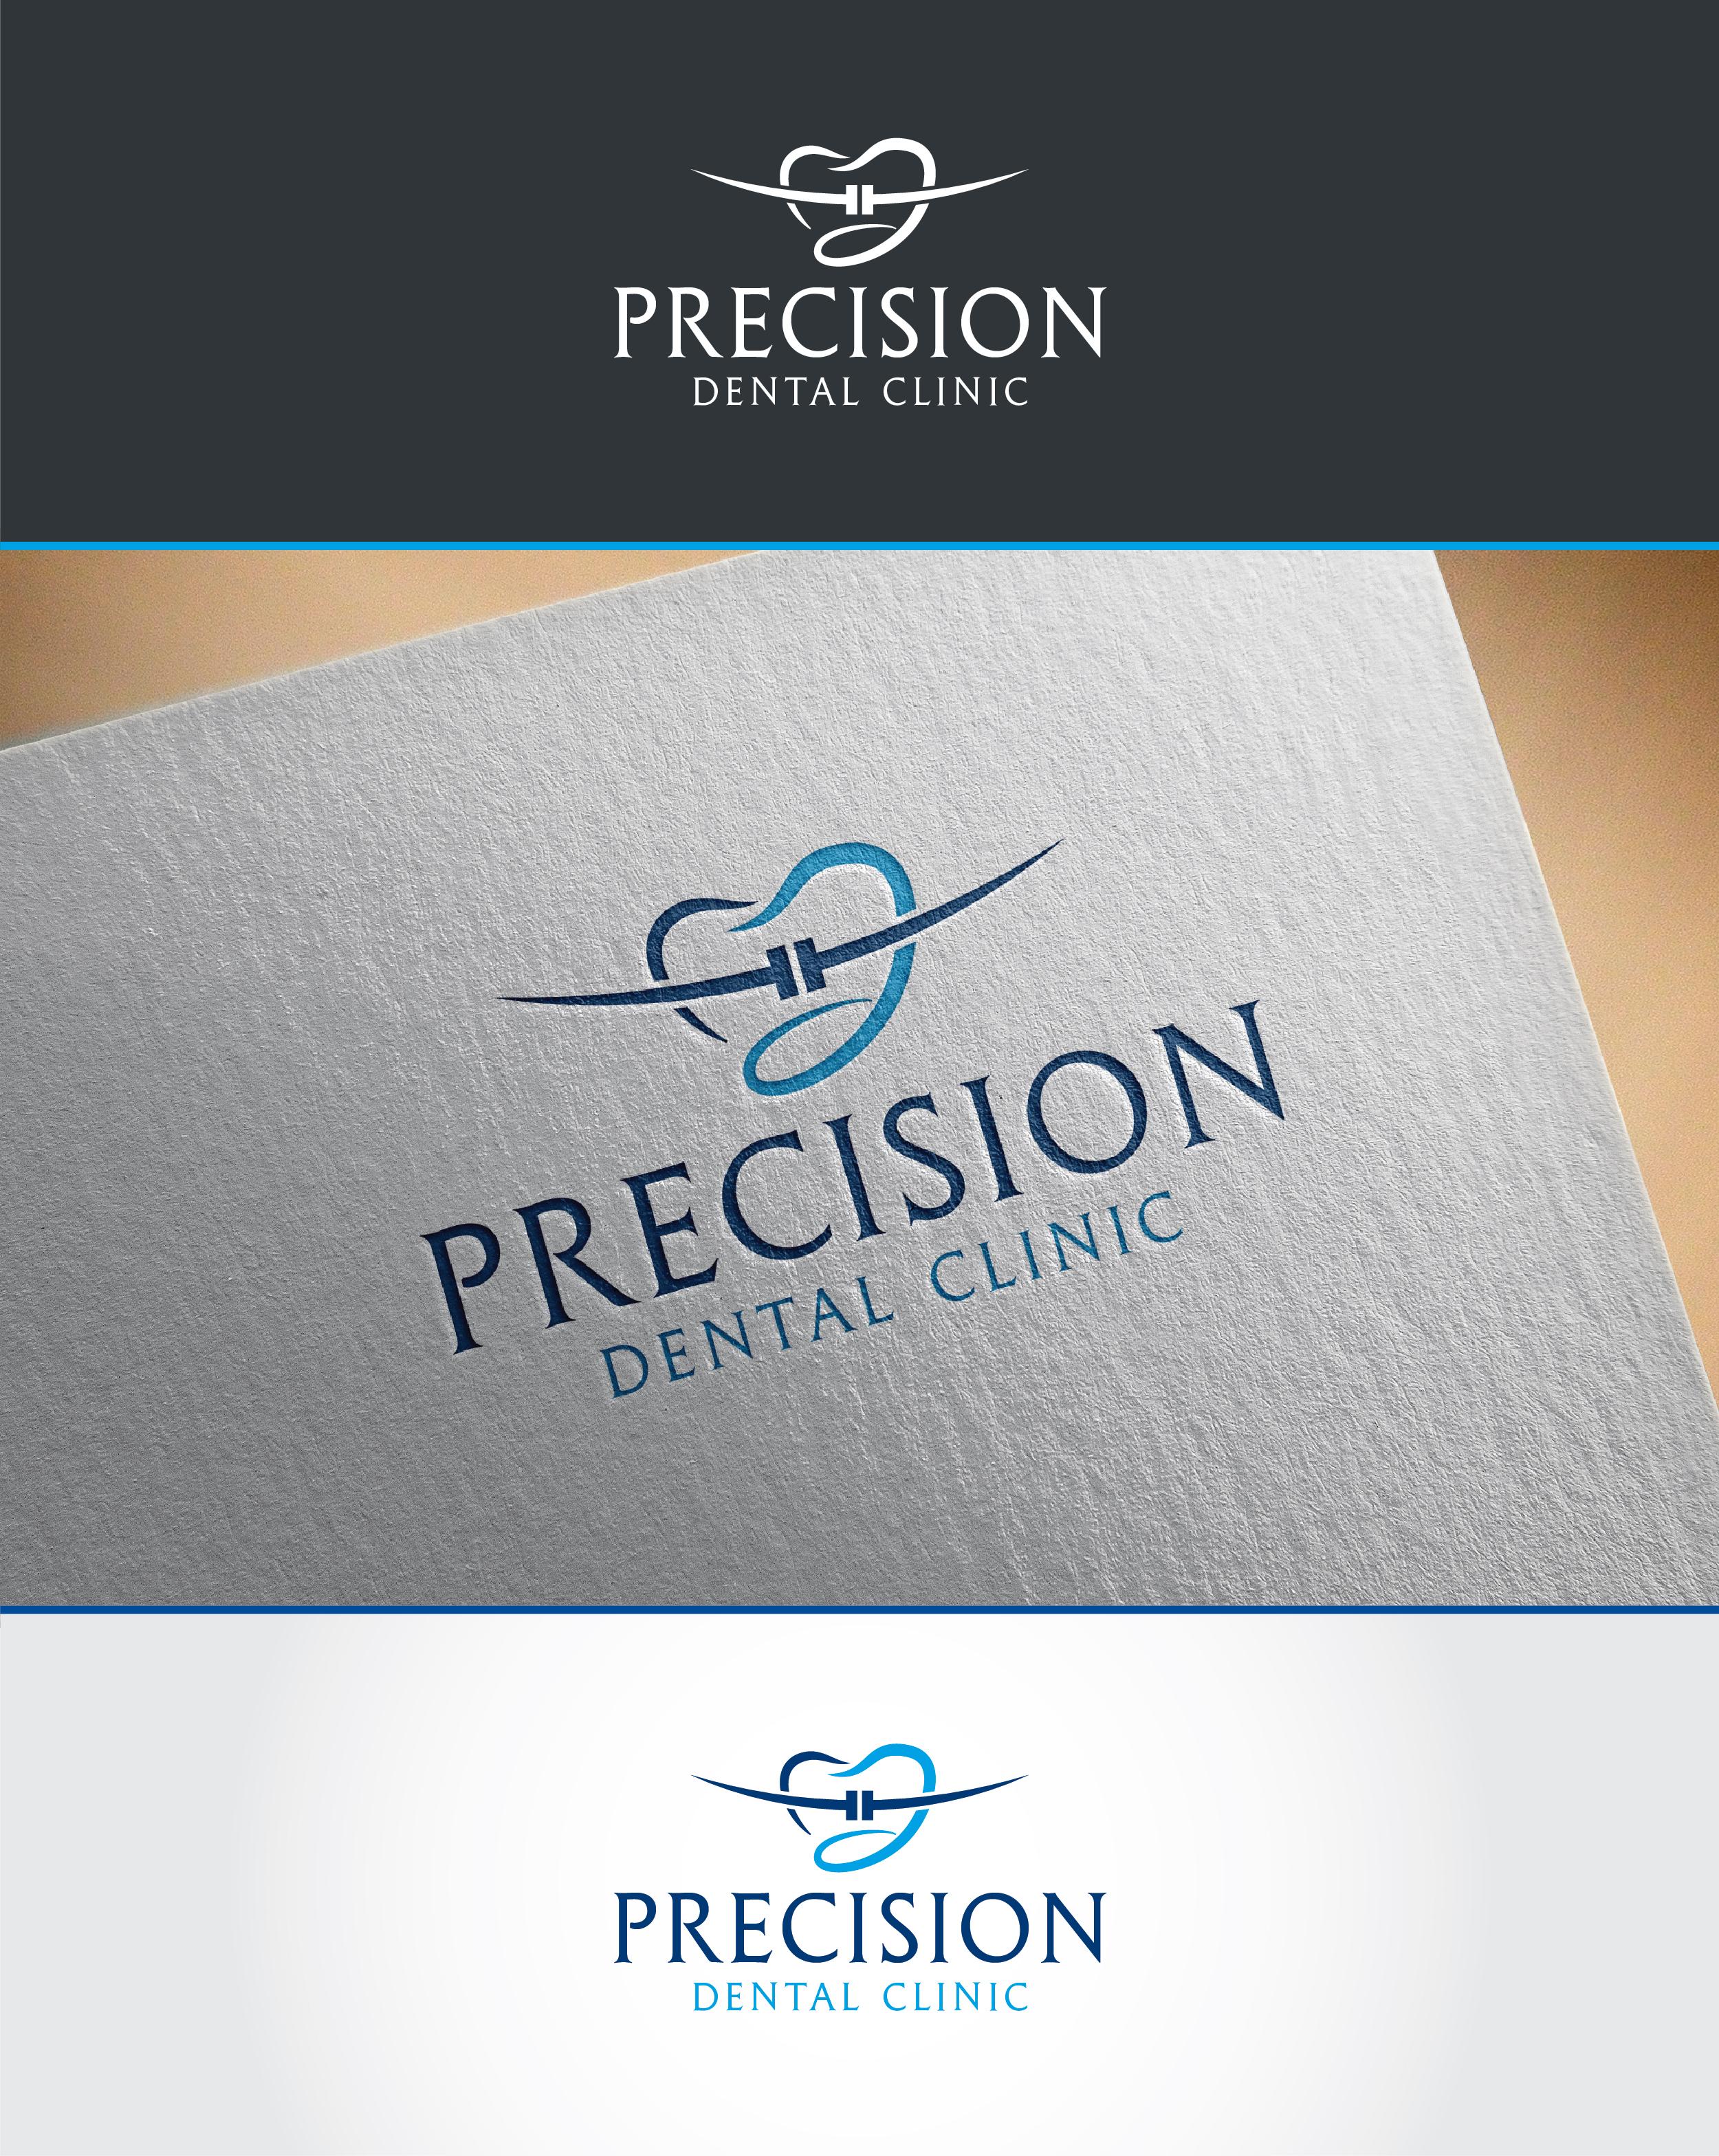 Logo Design by Shahab Uddin - Entry No. 79 in the Logo Design Contest Captivating Logo Design for Precision Dental Clinic.